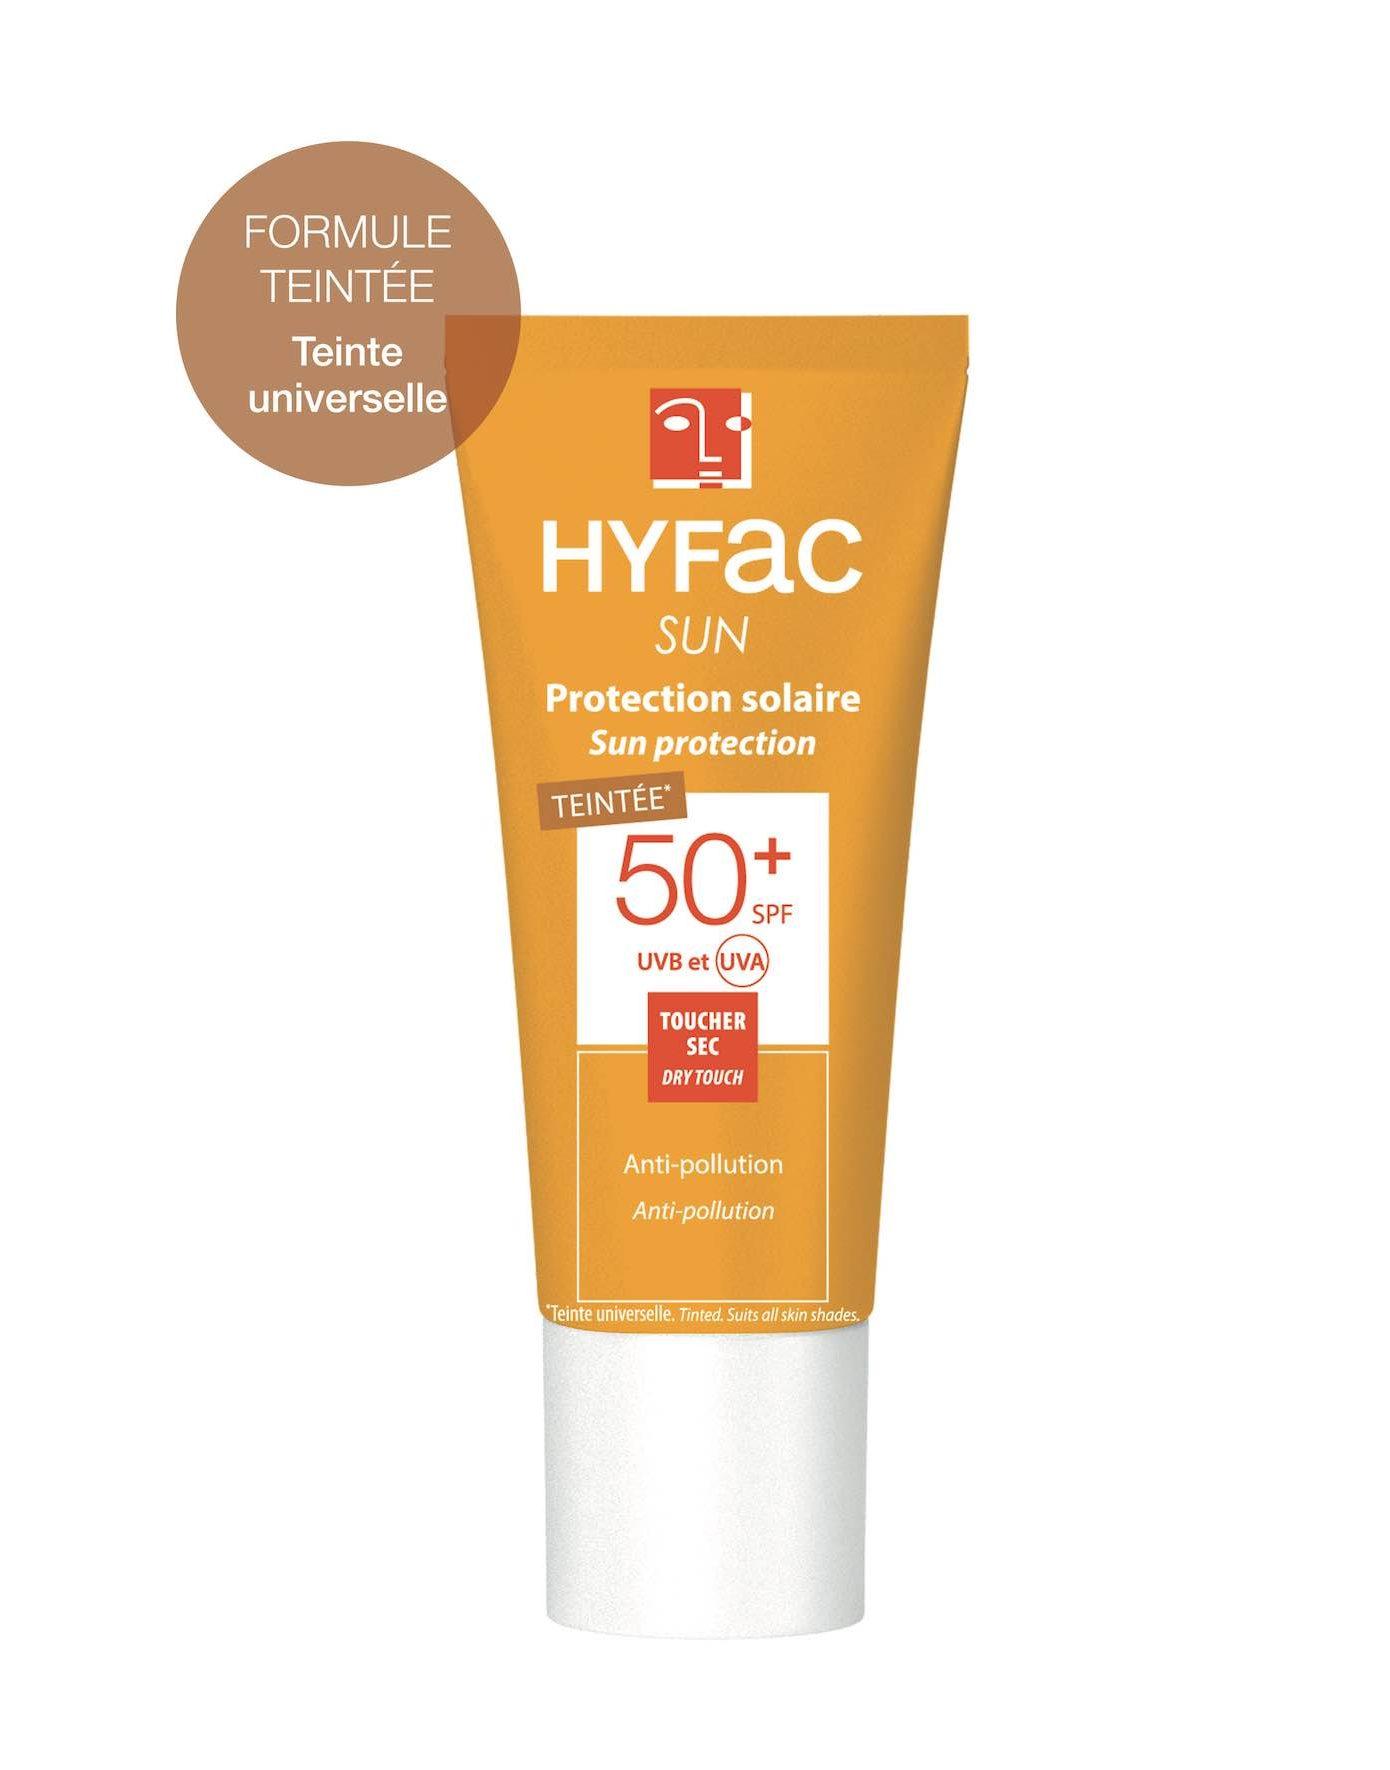 Hyfac sun protection solaire teintee